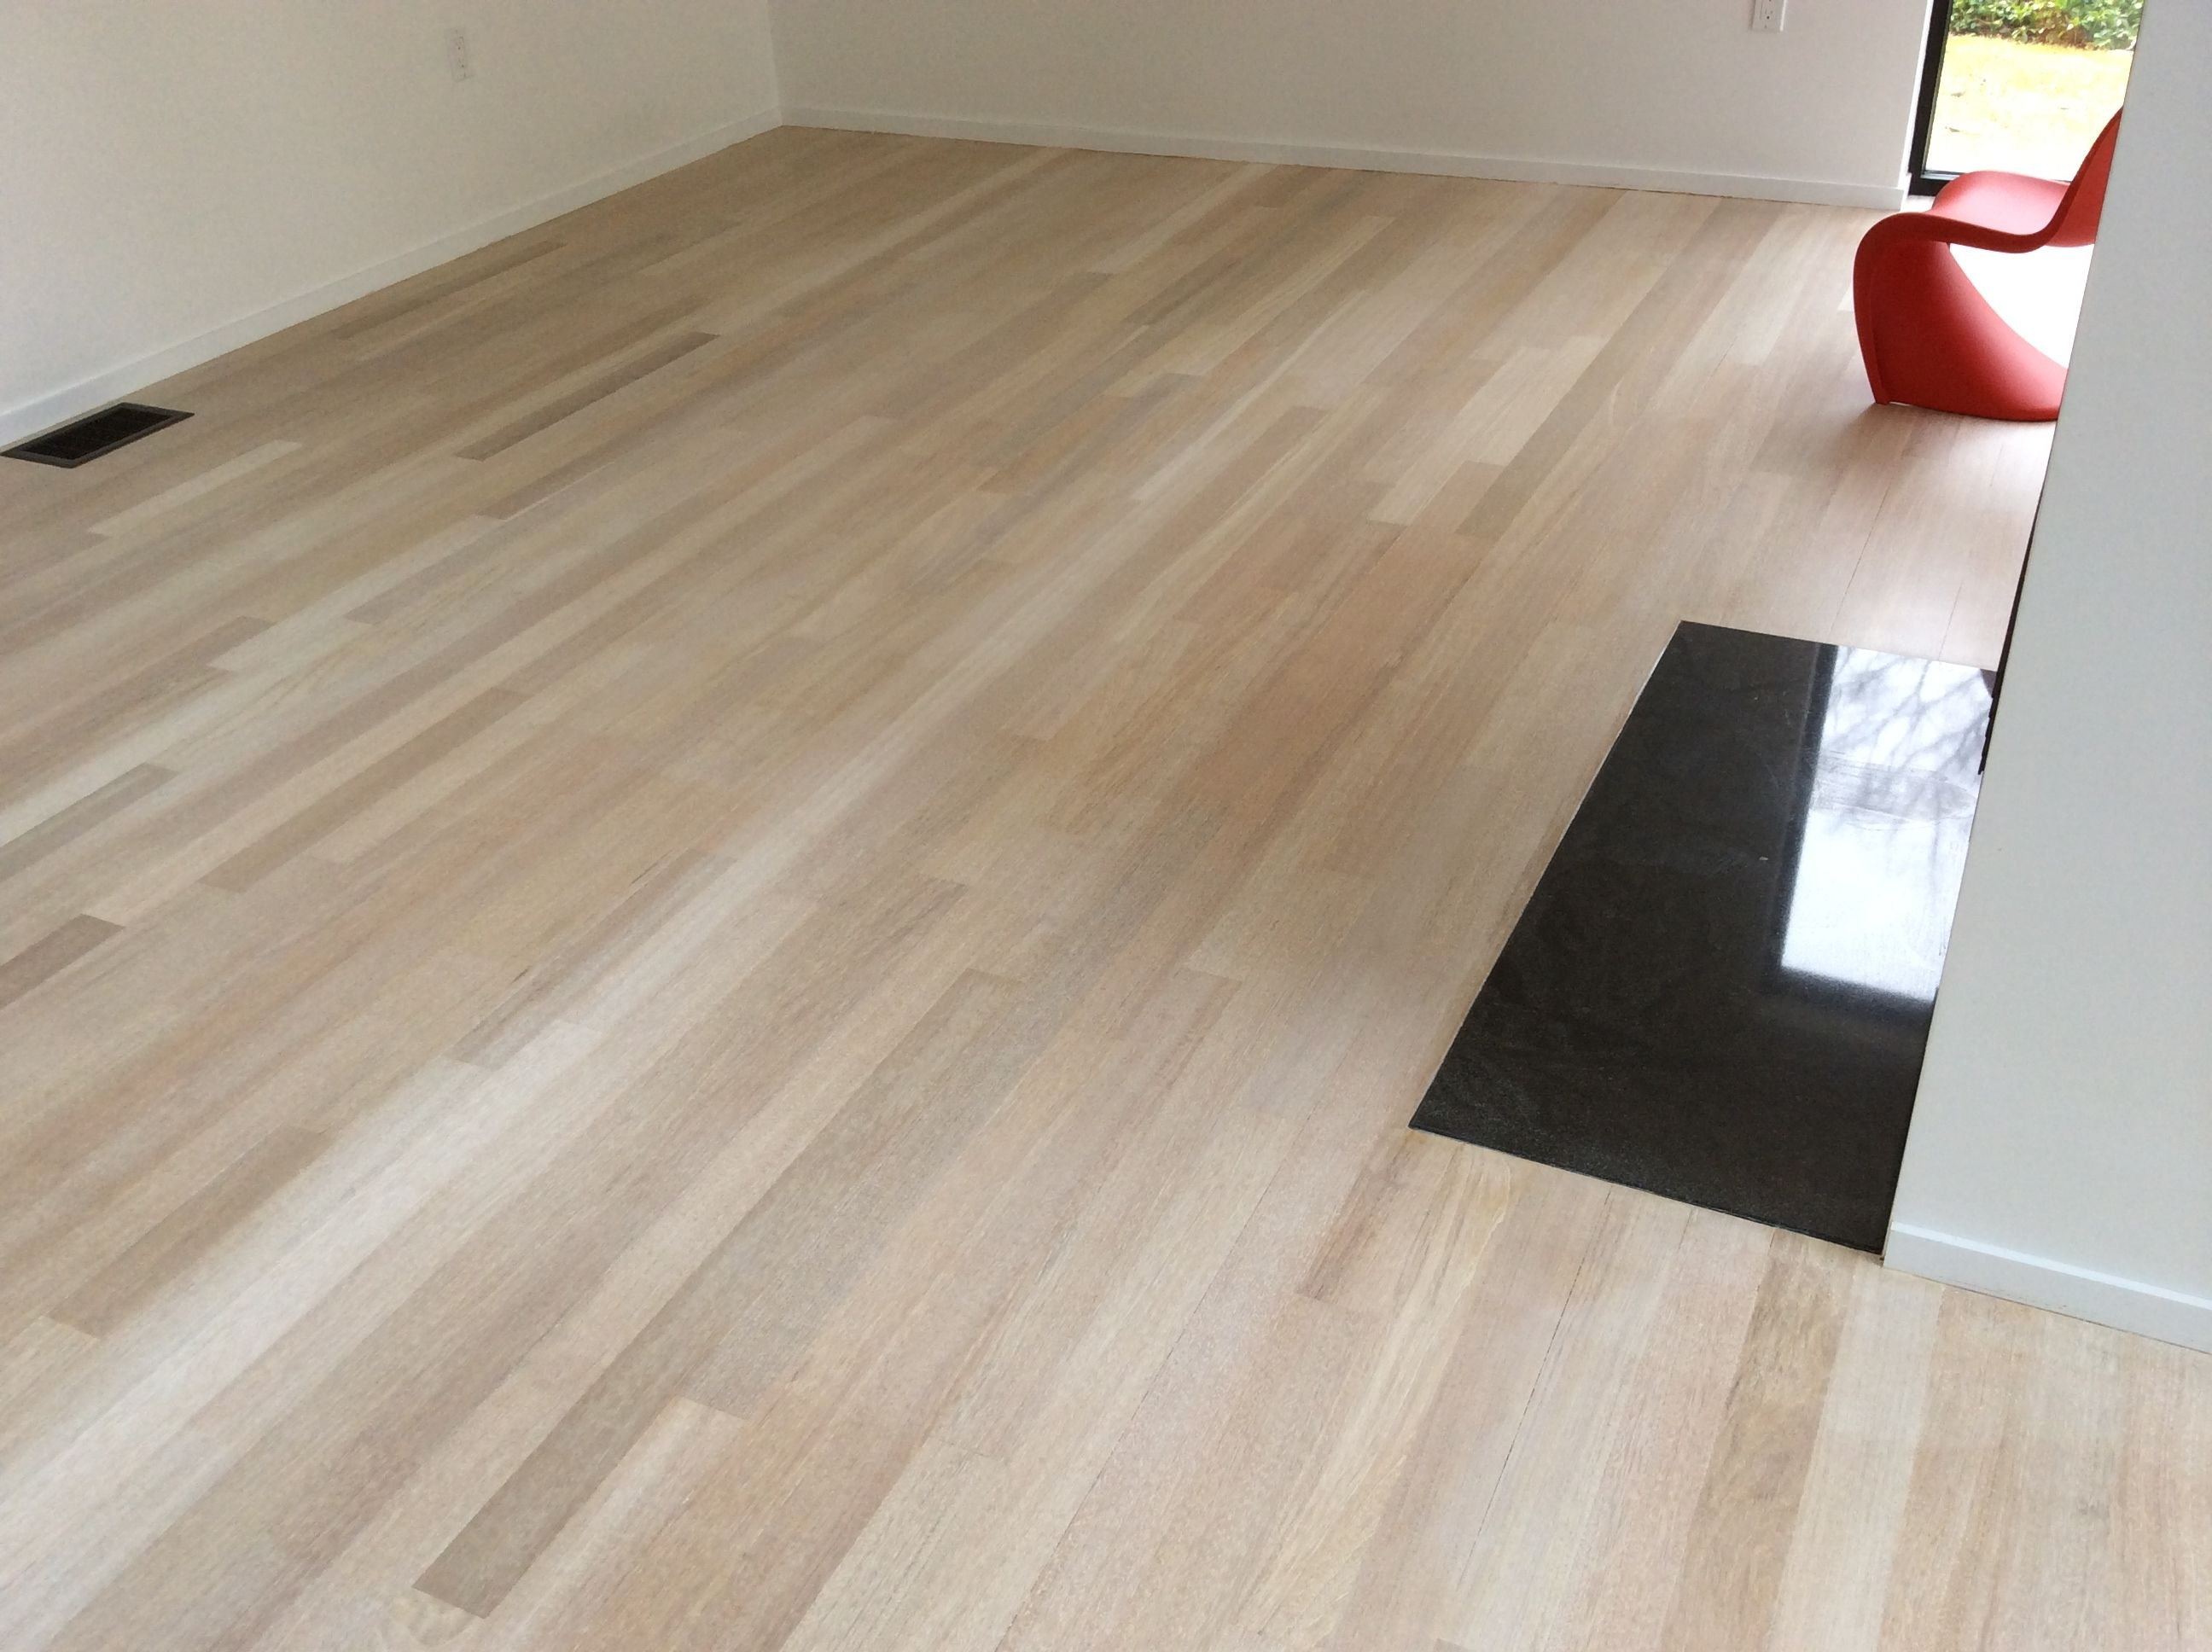 Pickled Wood Floor Finishes Brazilian Cherry Hardwood Flooring